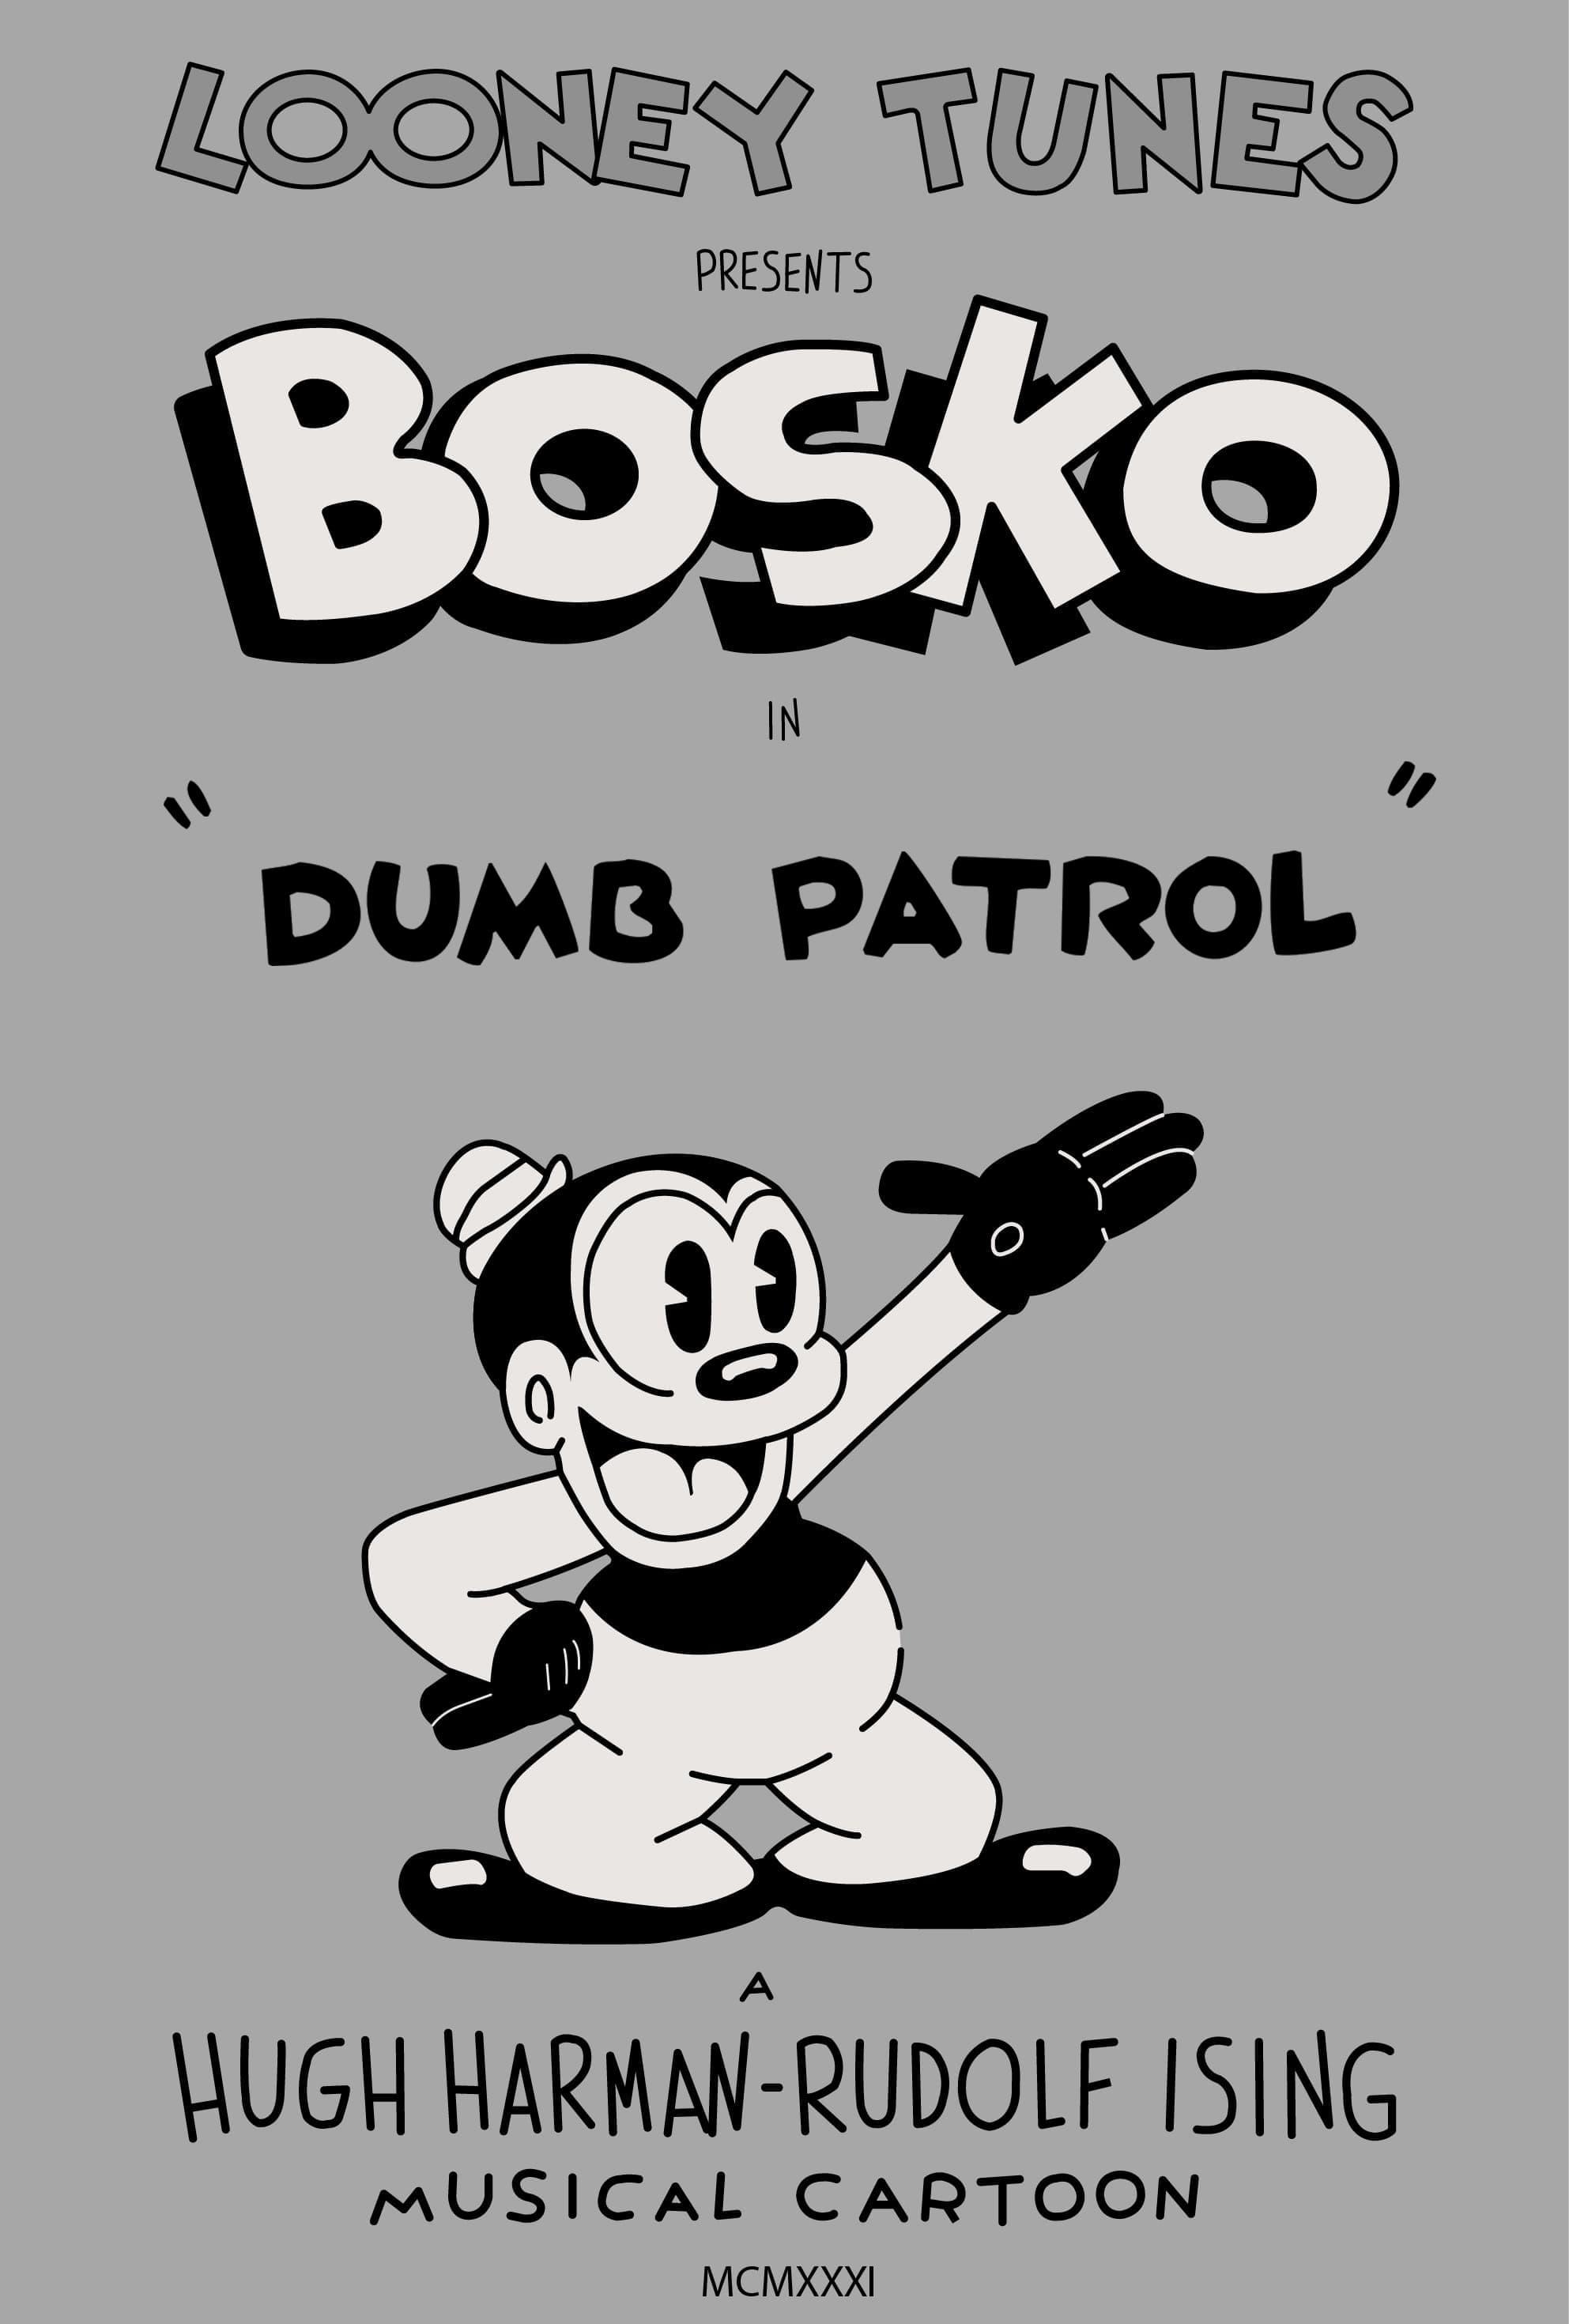 Dumb Patrol